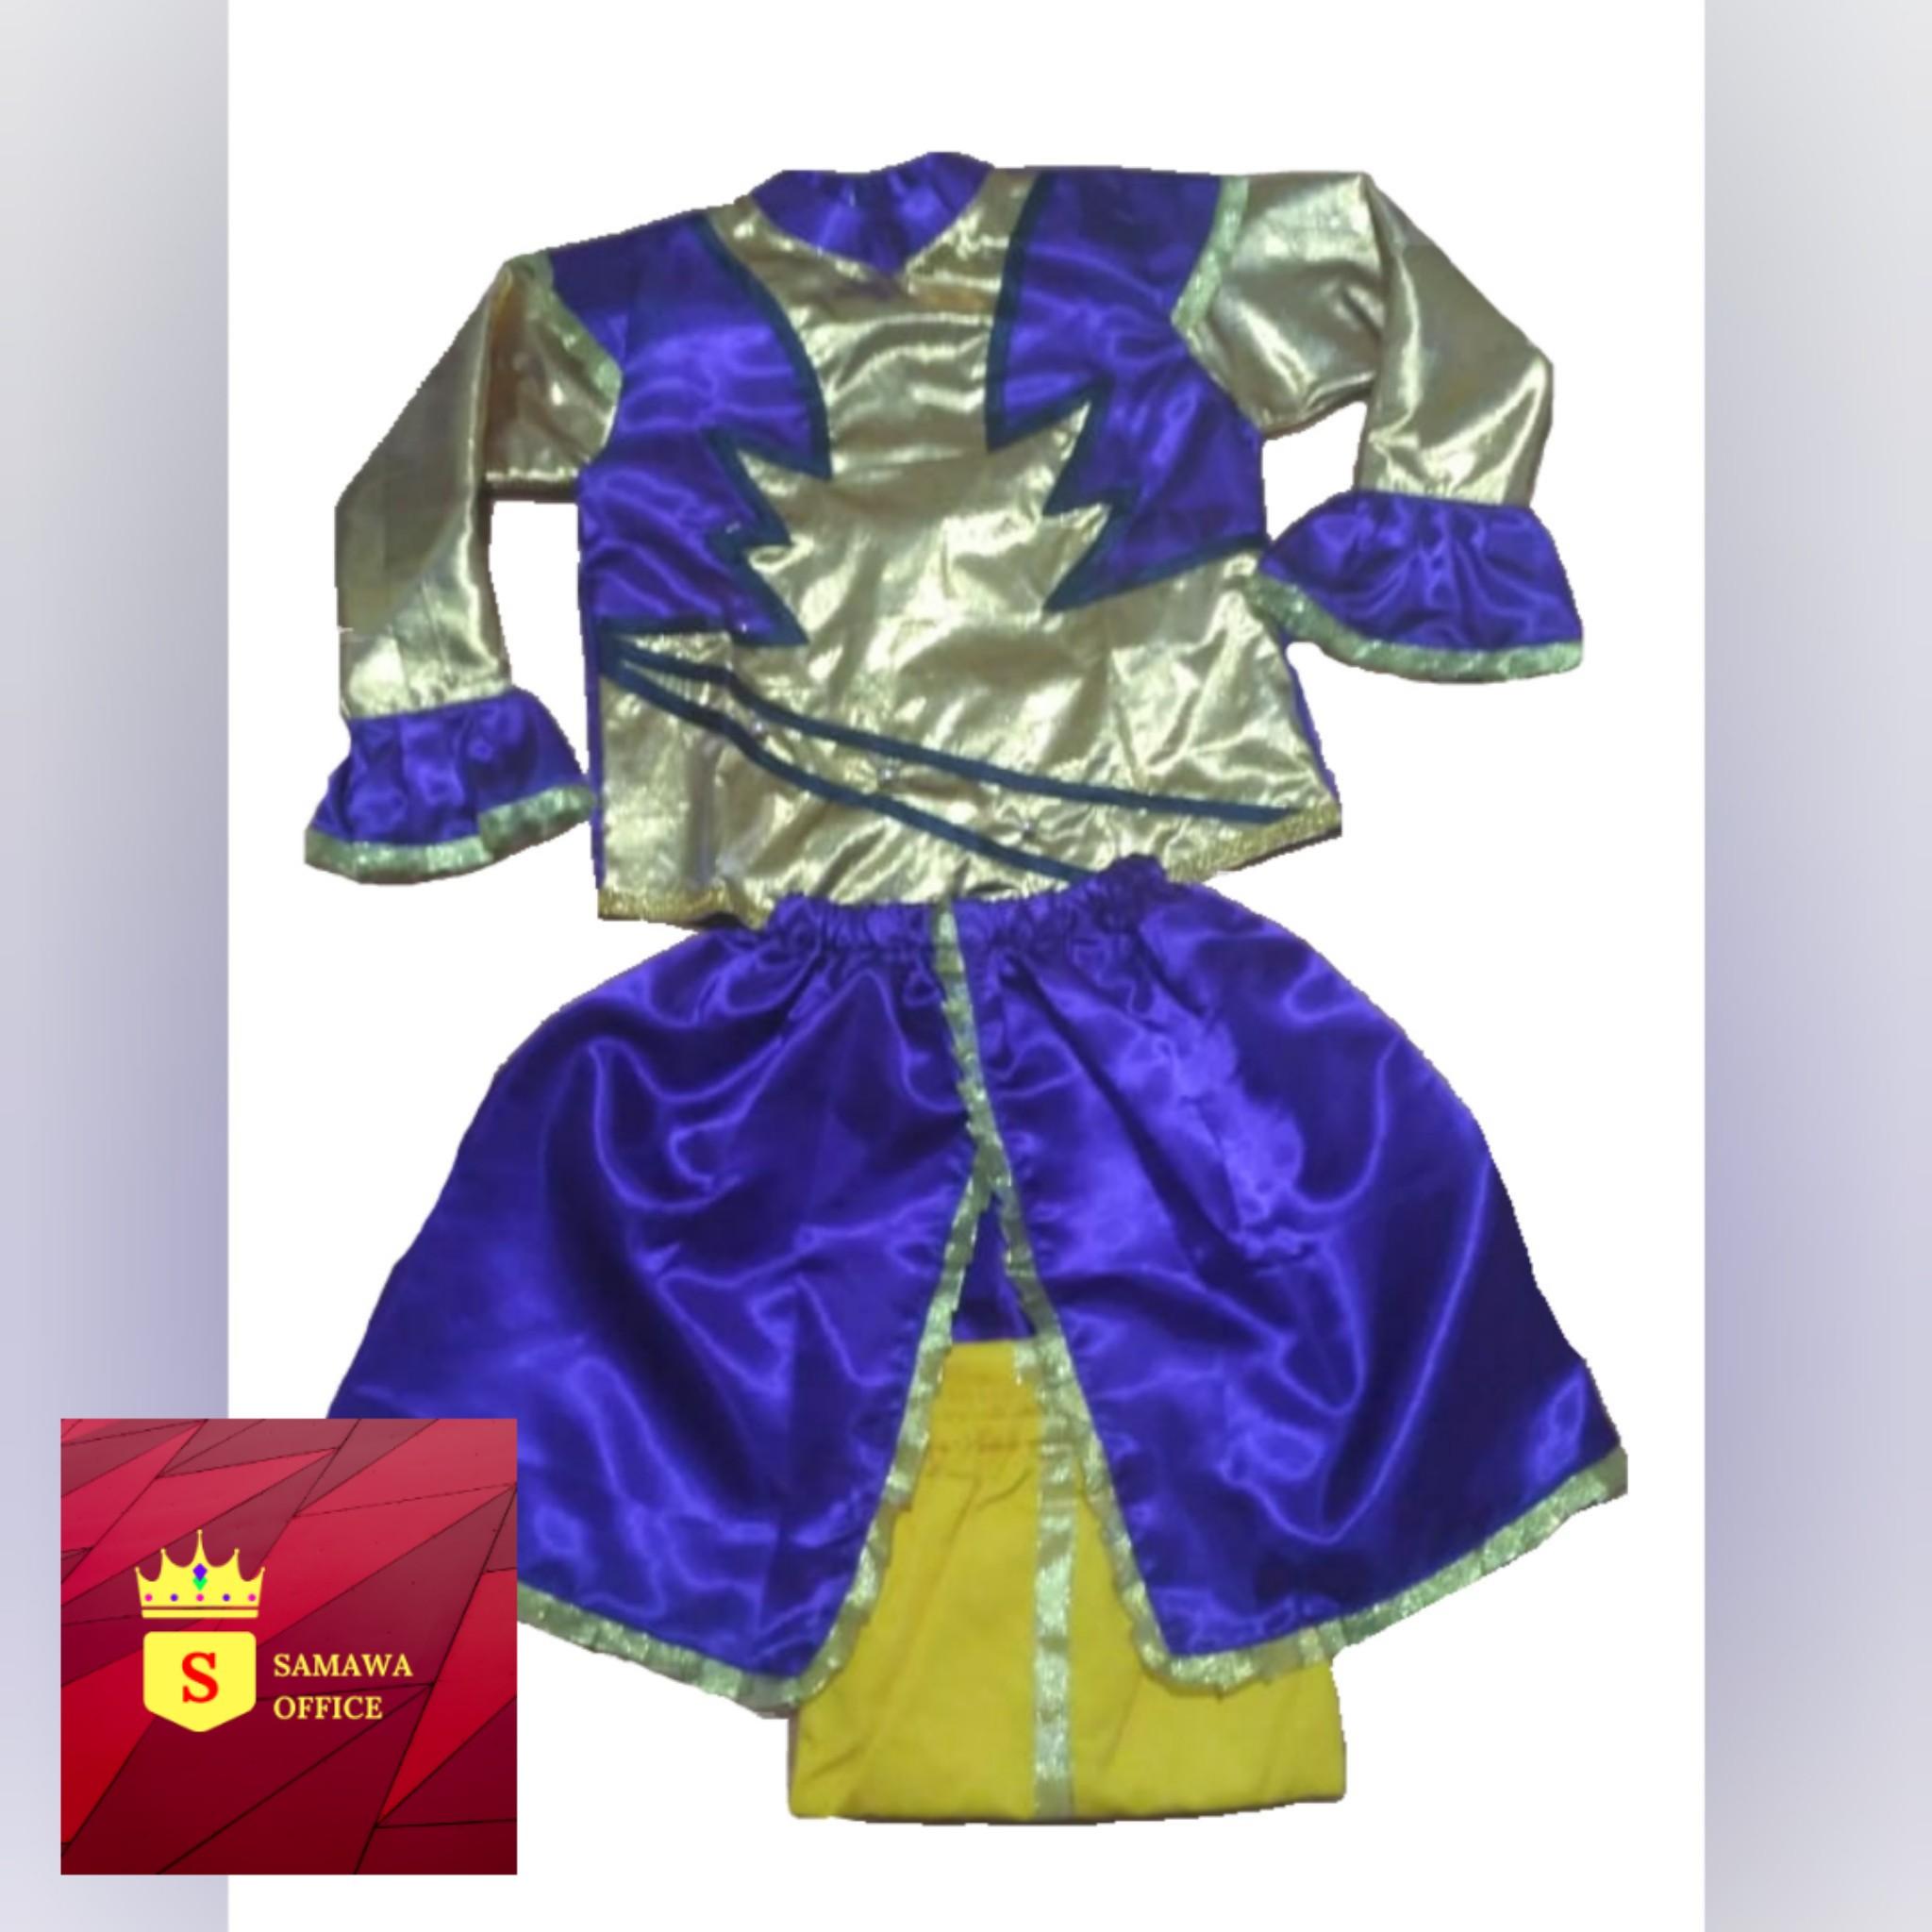 Kostum, Baju, Seragam Mayoret Terbaru - Kostum Mayoret